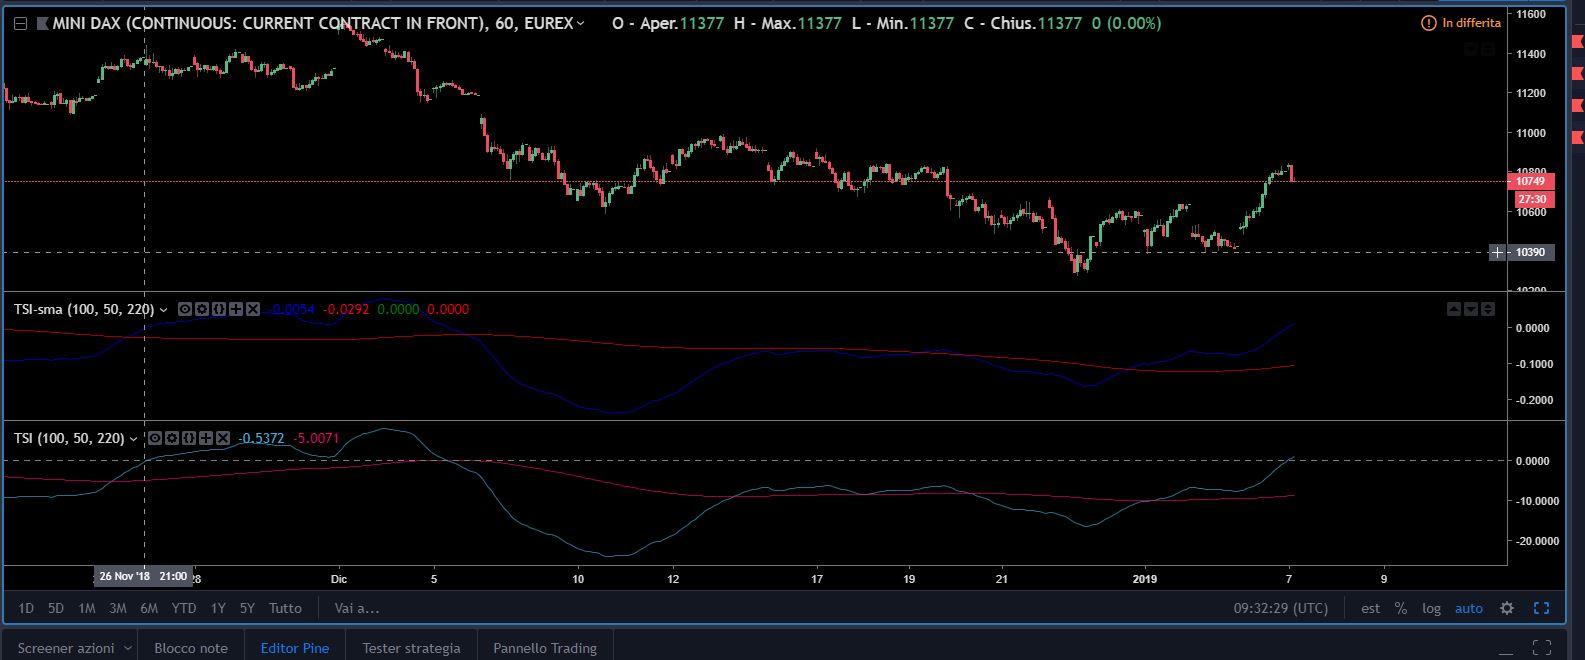 TSI-sma (TradingView) | ProRealTime trading